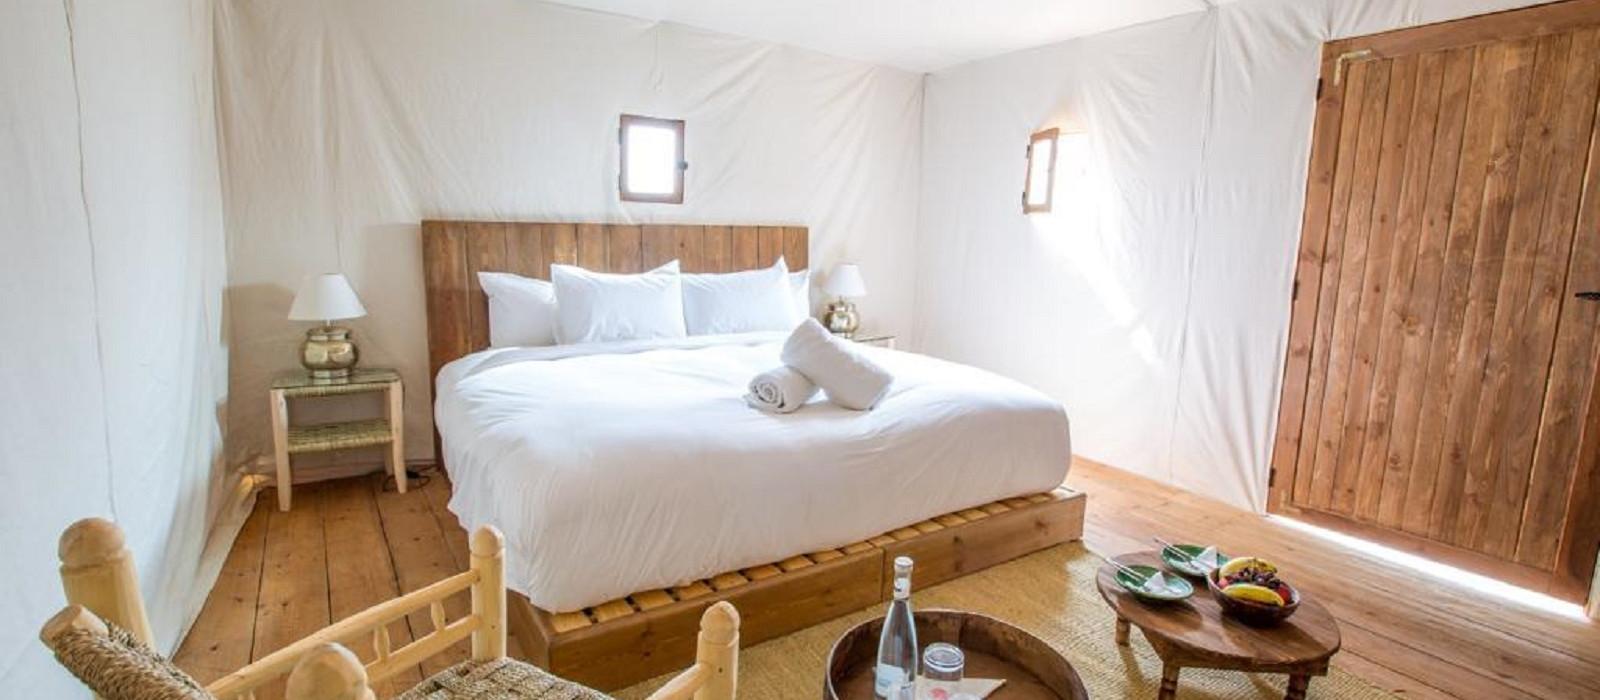 Hotel The White Camel Lodge Marokko